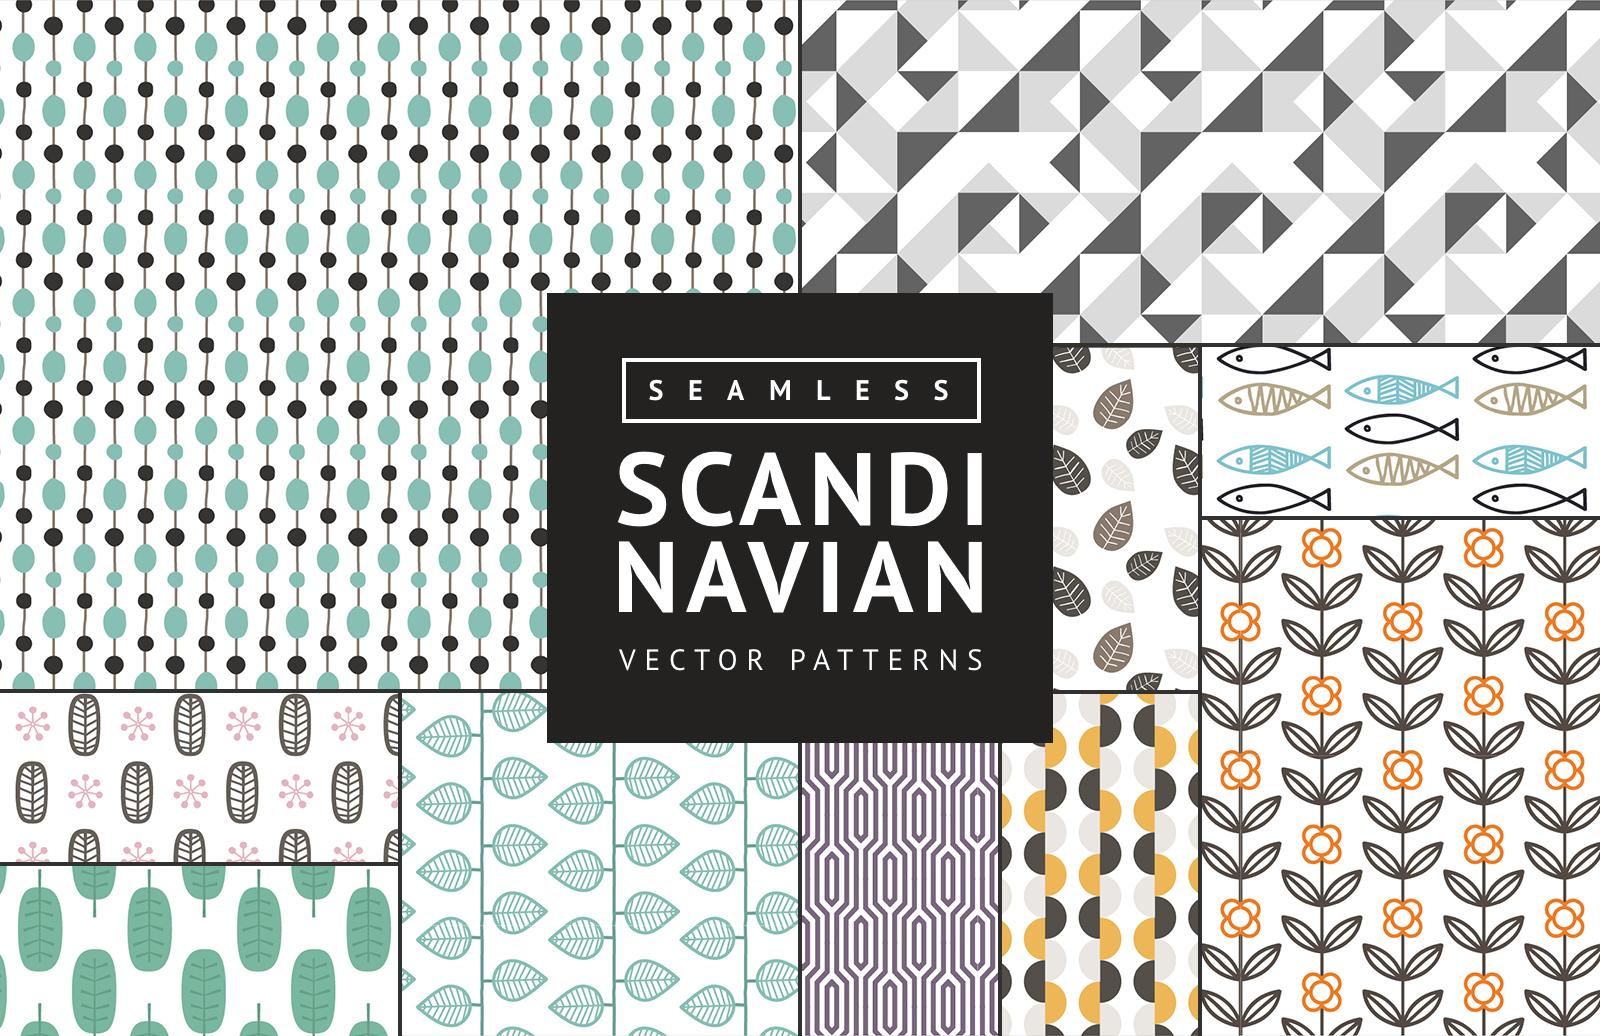 Large Seamless  Scandinavian  Vector  Patterns  Preview 1A